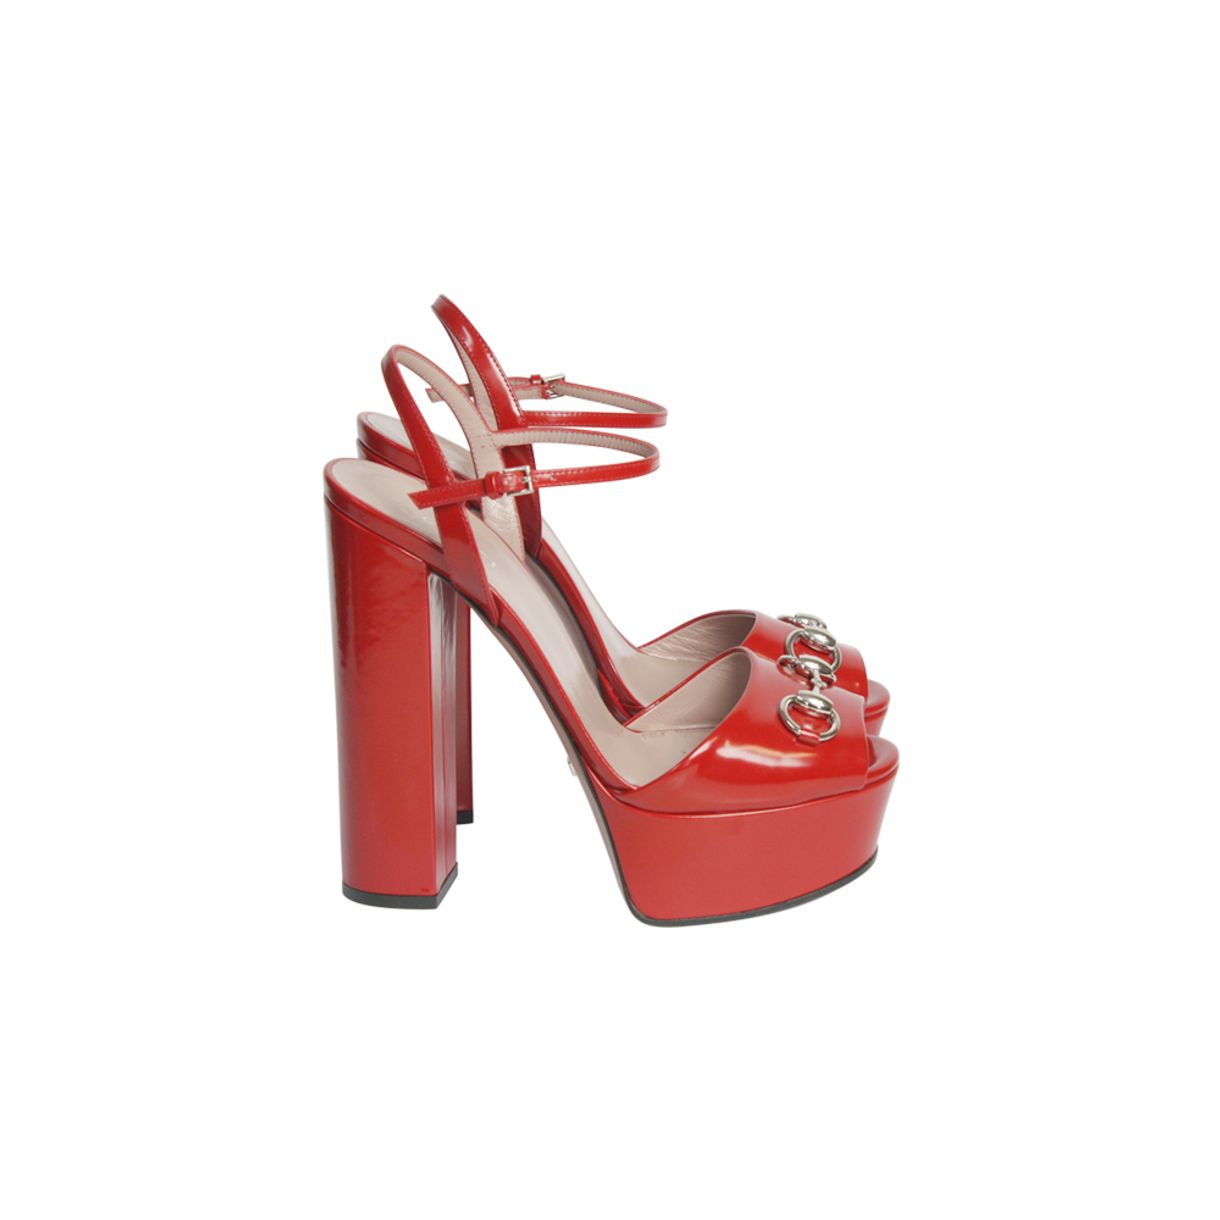 Sandalia-Gucci-Claudie-Verniz-Vermelha